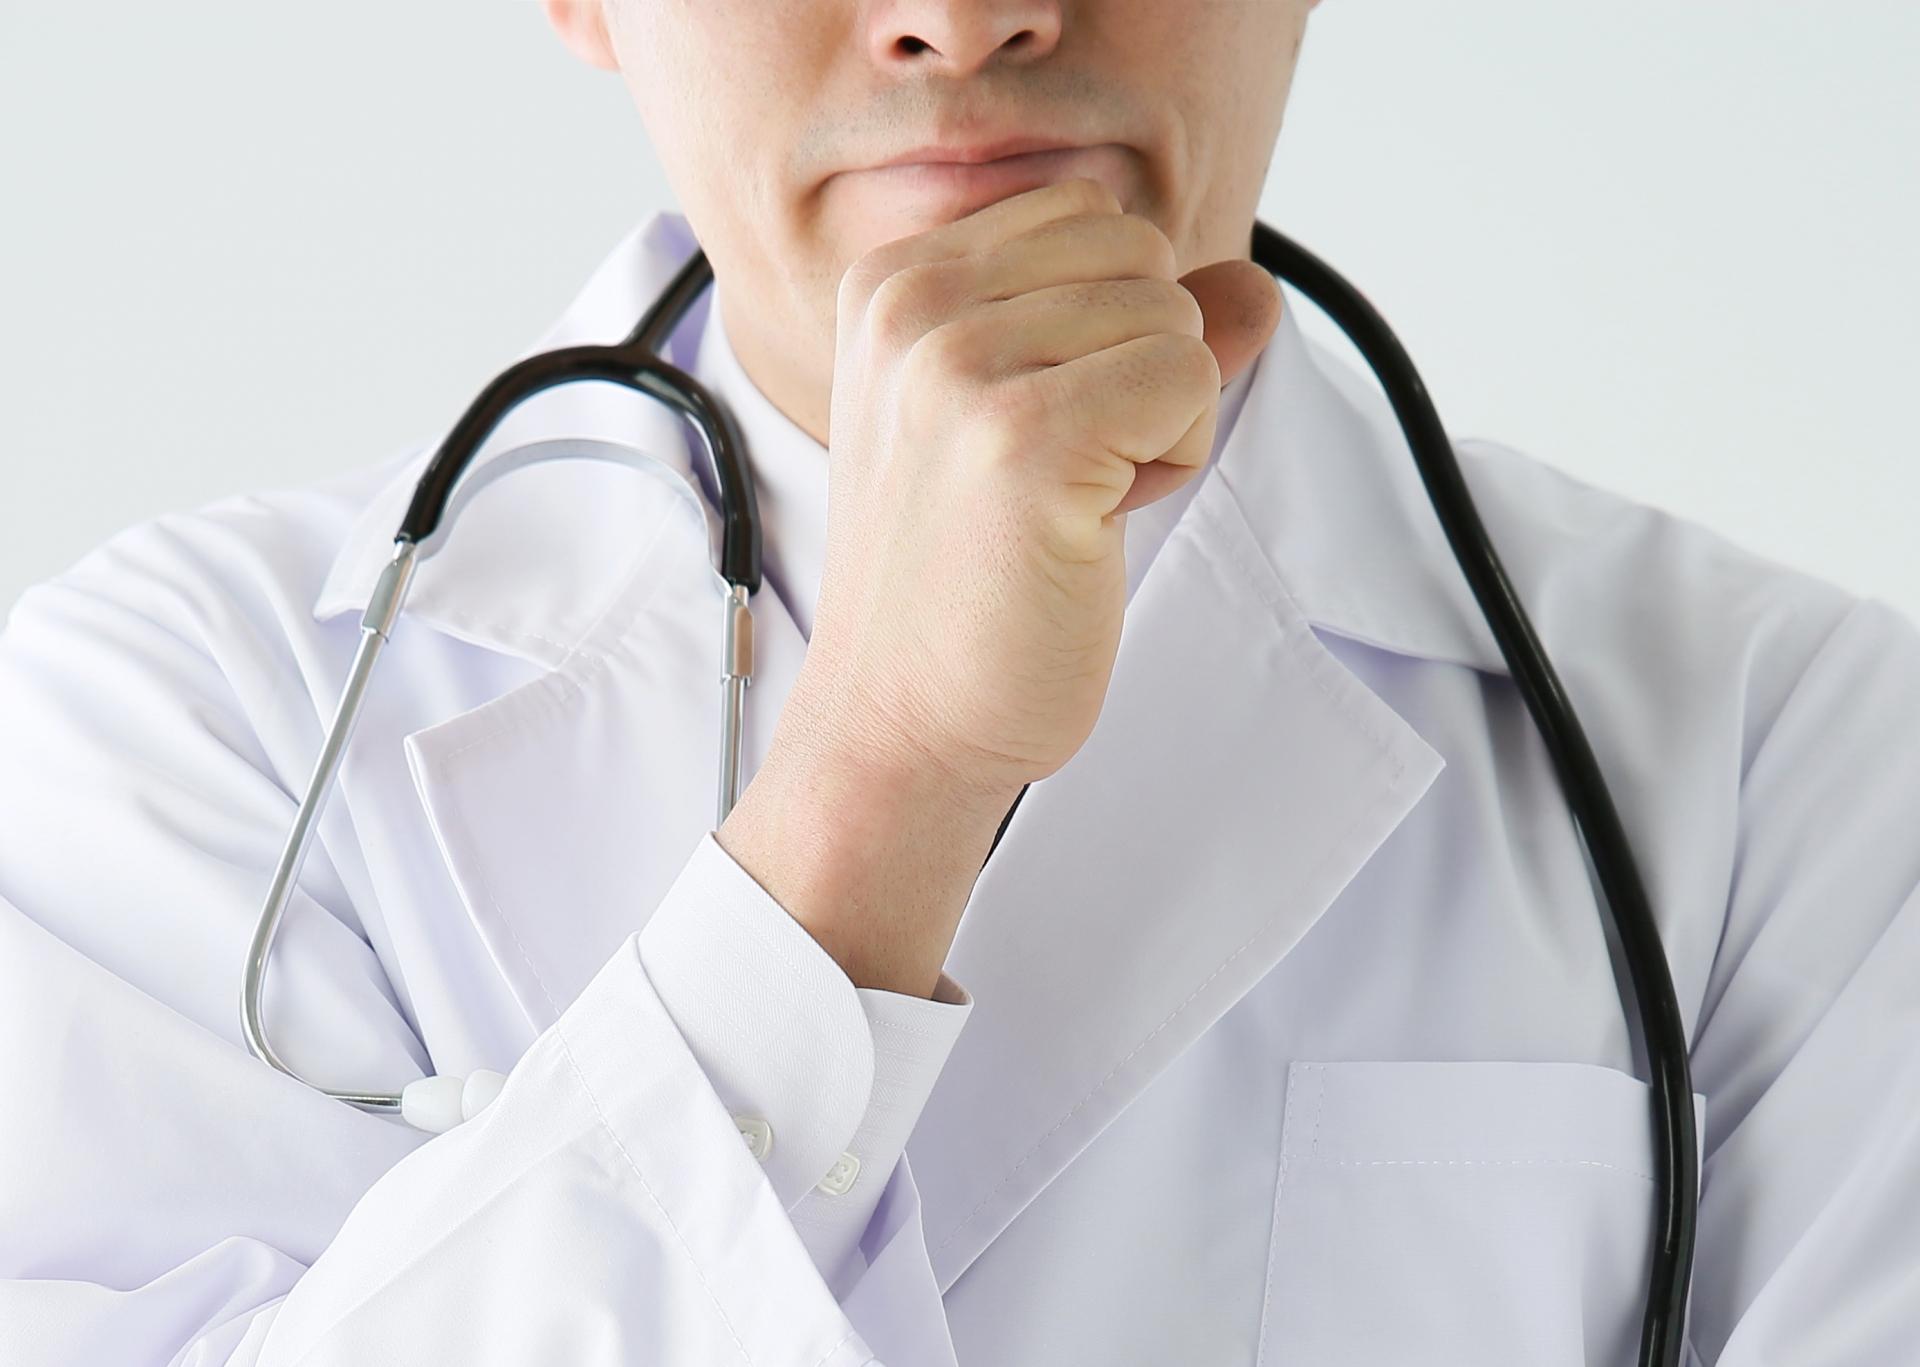 0e69c42f72ea49067110e8a81f390eb0 m フィナステリドは本当に効果ある?ある皮膚科医自身の治験